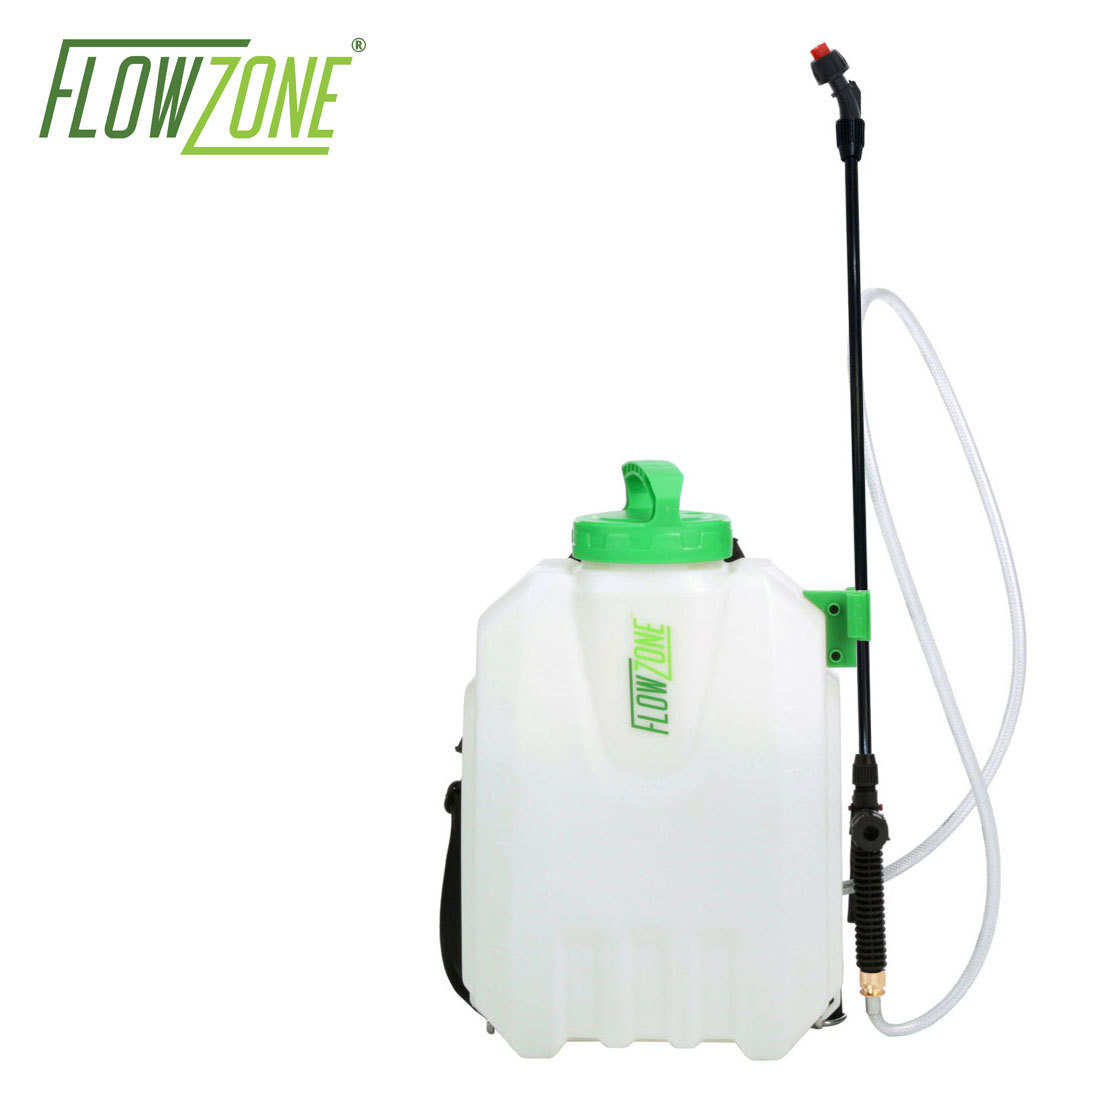 Storm 2.5-Gallon Sprayer (Series 1)